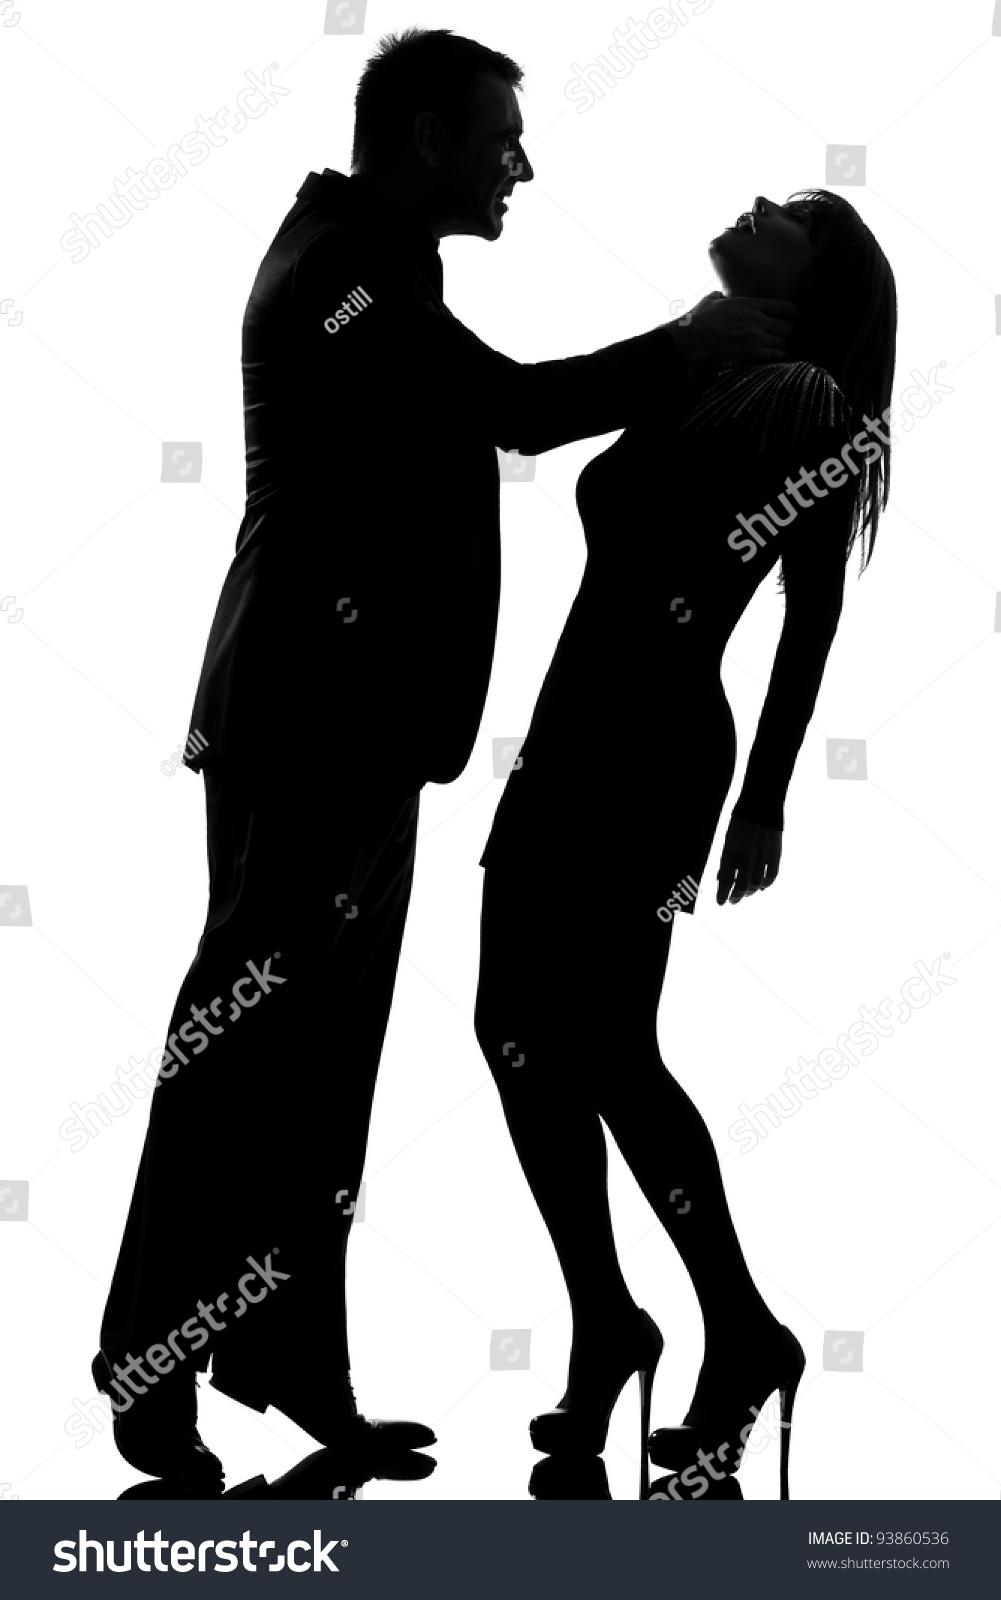 High Resolution Violence Domestic